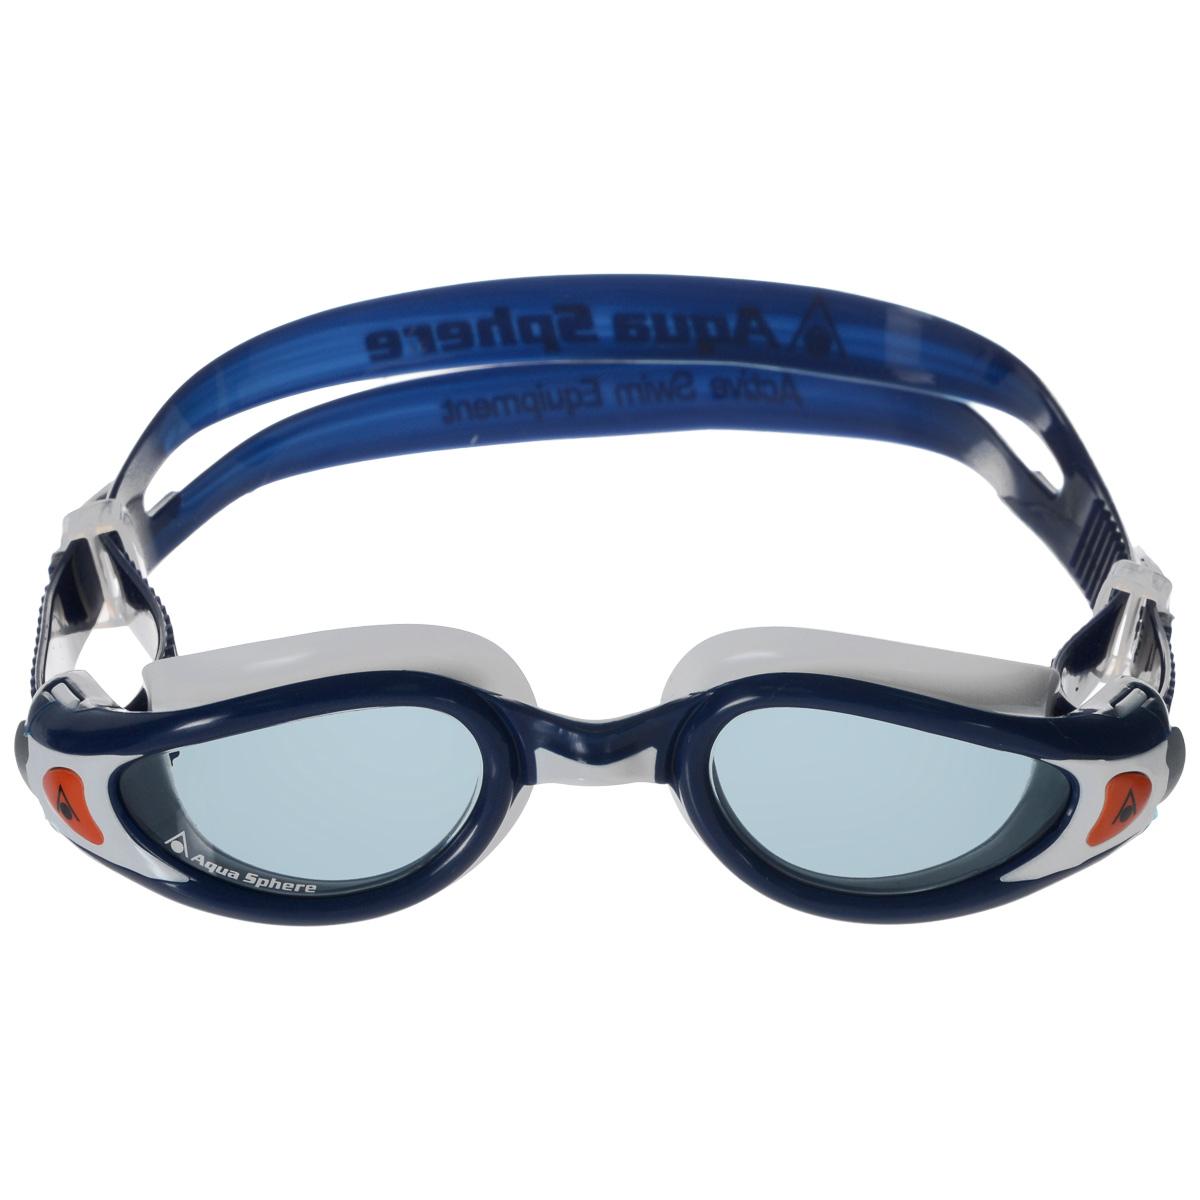 Очки для плавания Aqua Sphere Kaiman Exo Junior, цвет: белый, синий цена